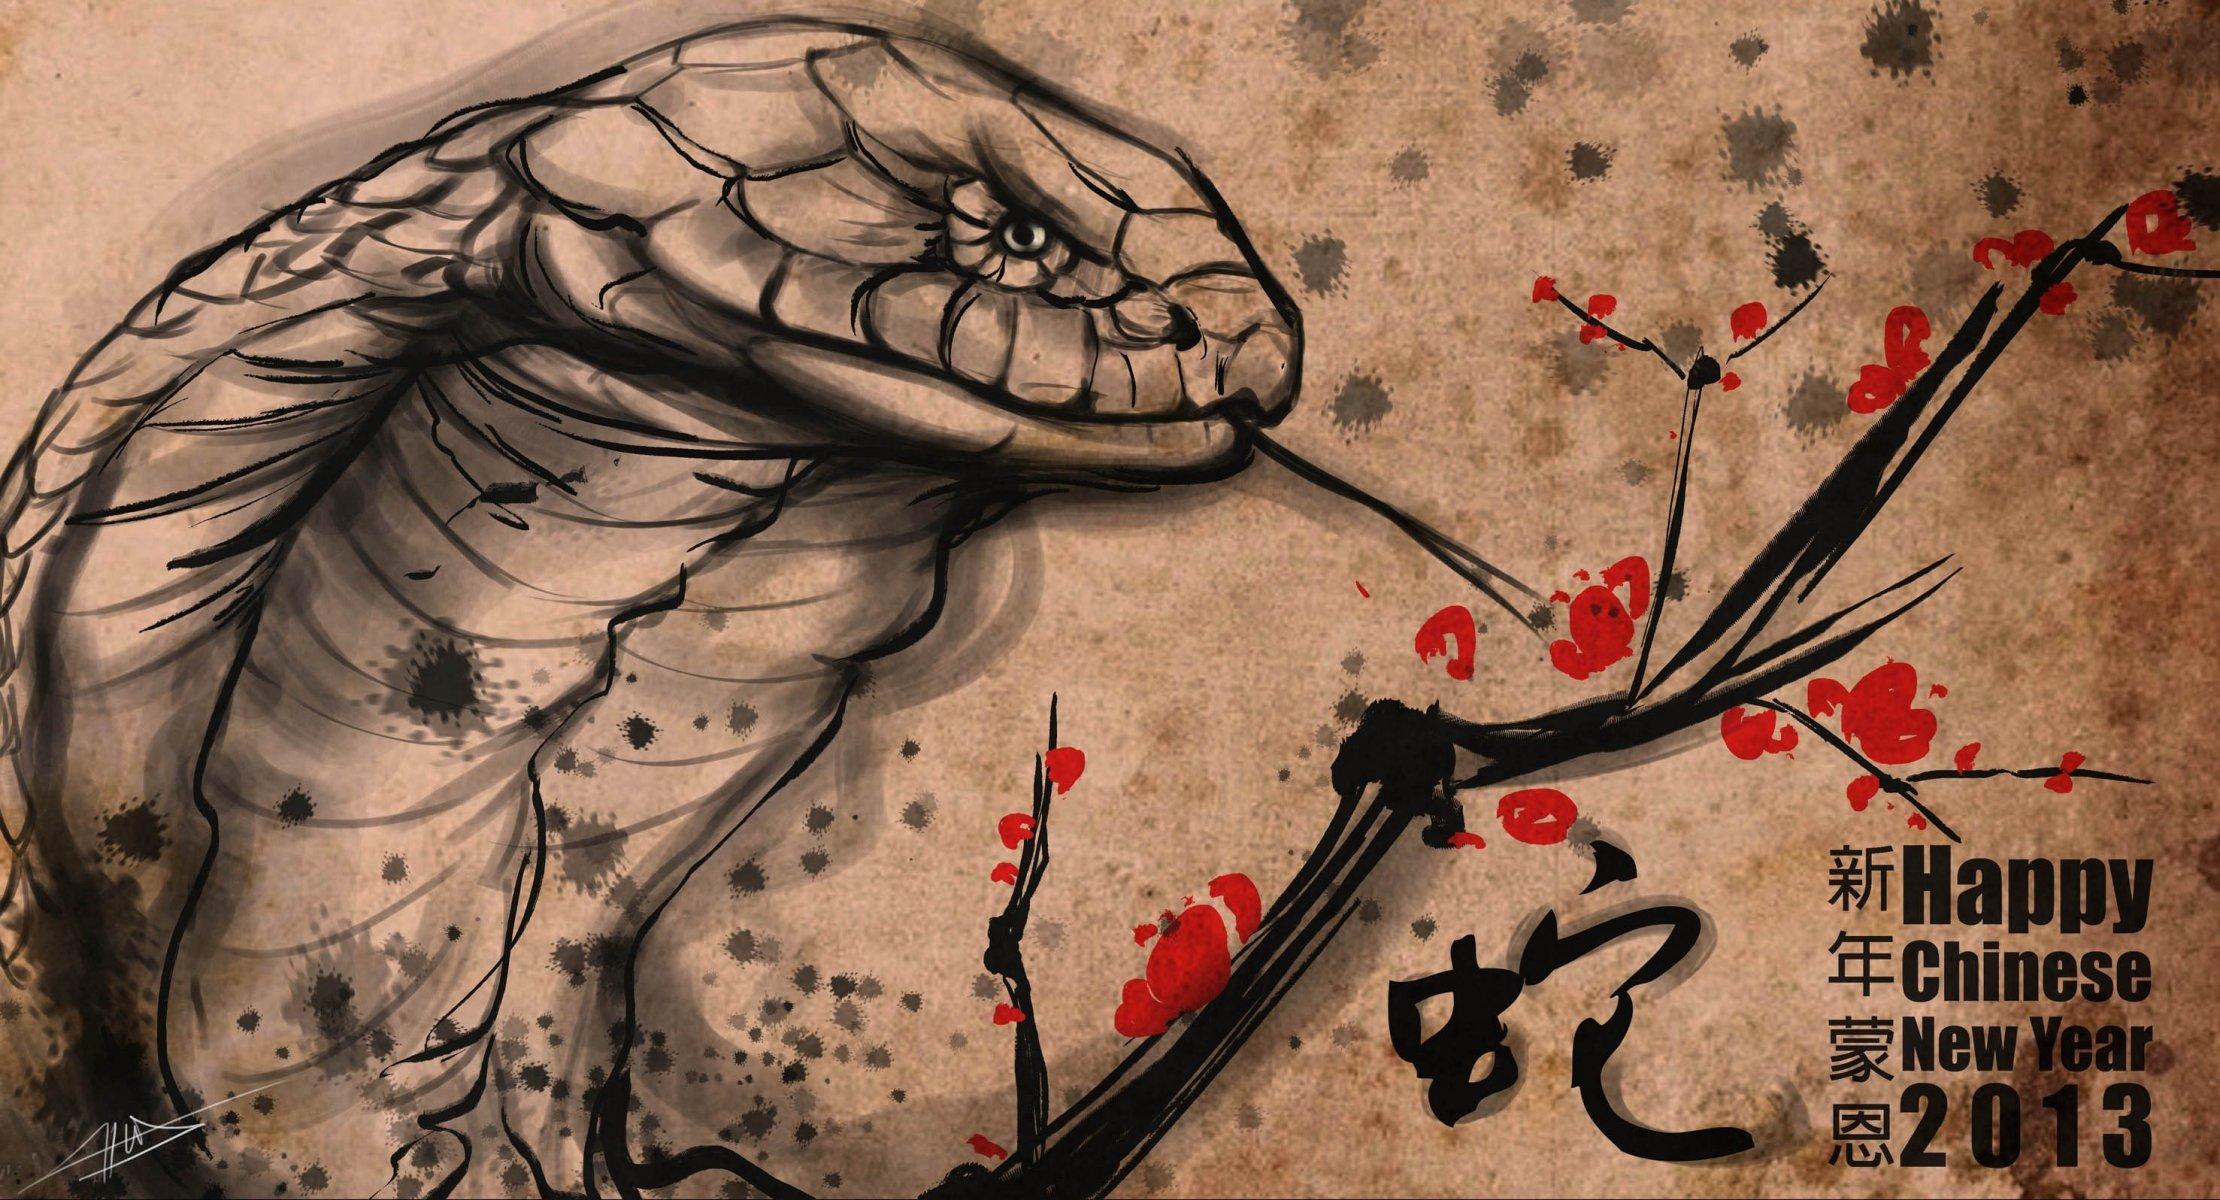 Обои рисунок, картинка, живопись, змей, Фантастика. Разное foto 19